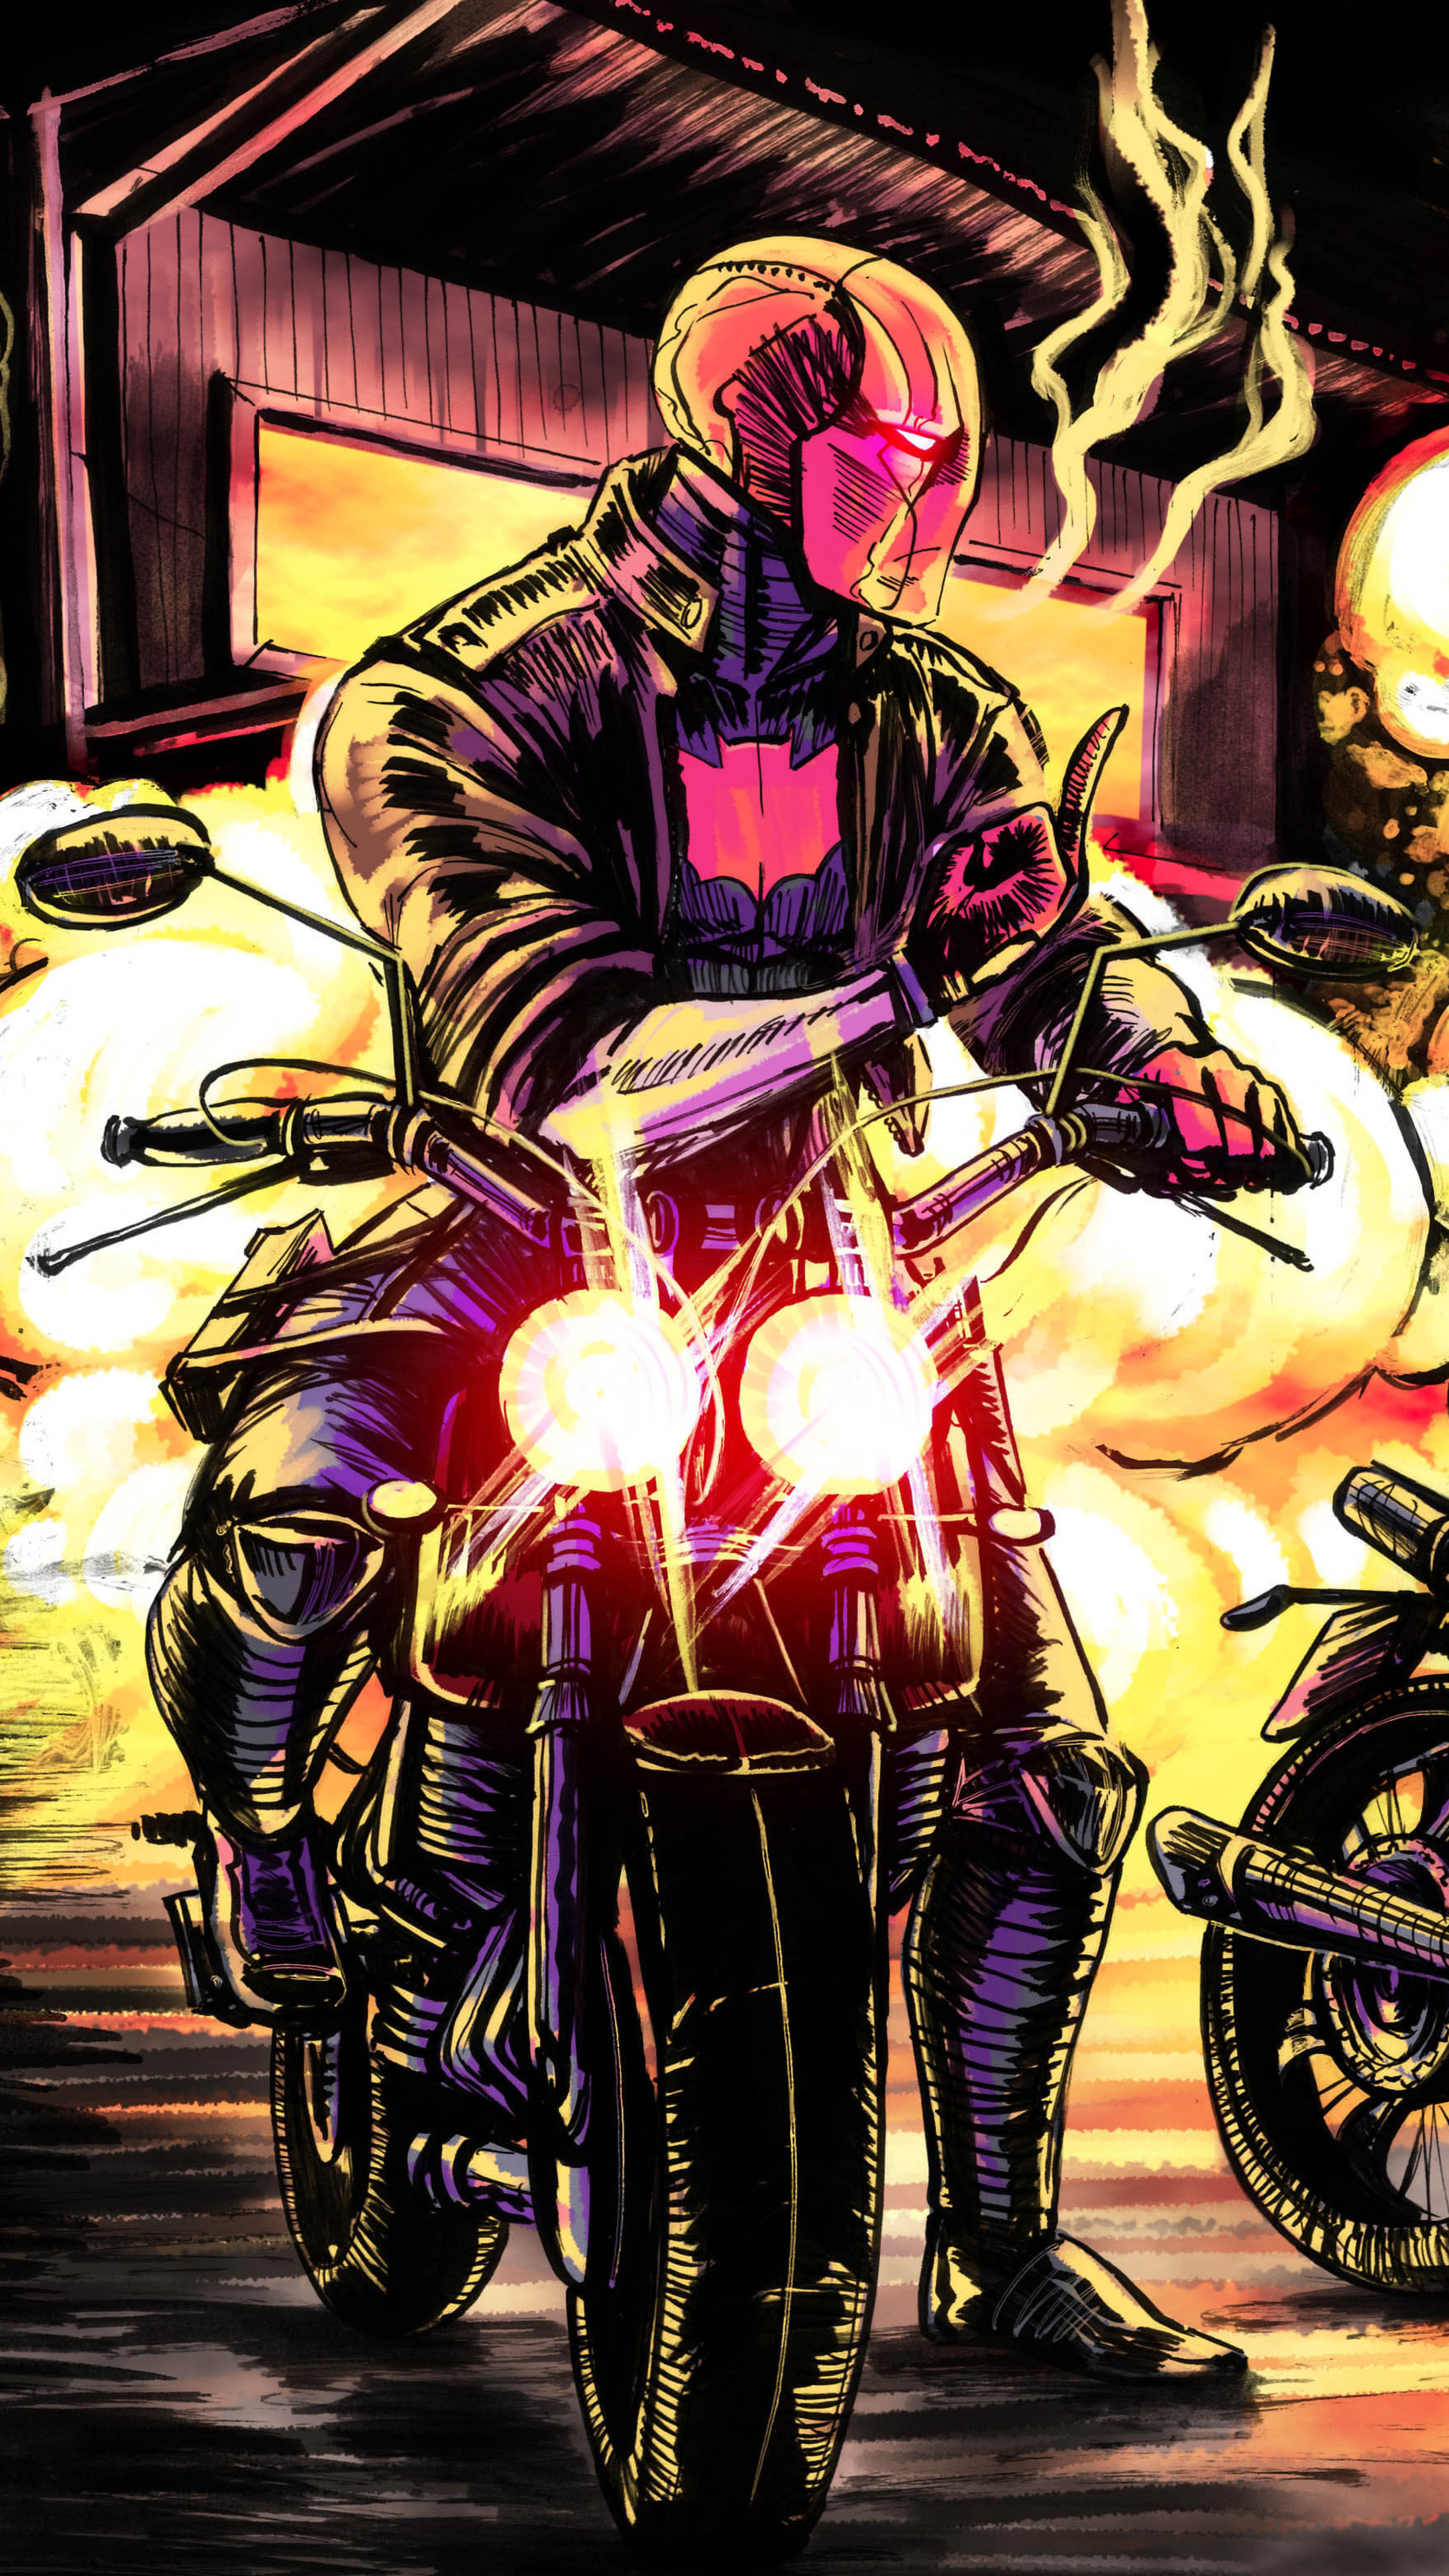 redhood-and-arsenal-artwork-kl.jpg